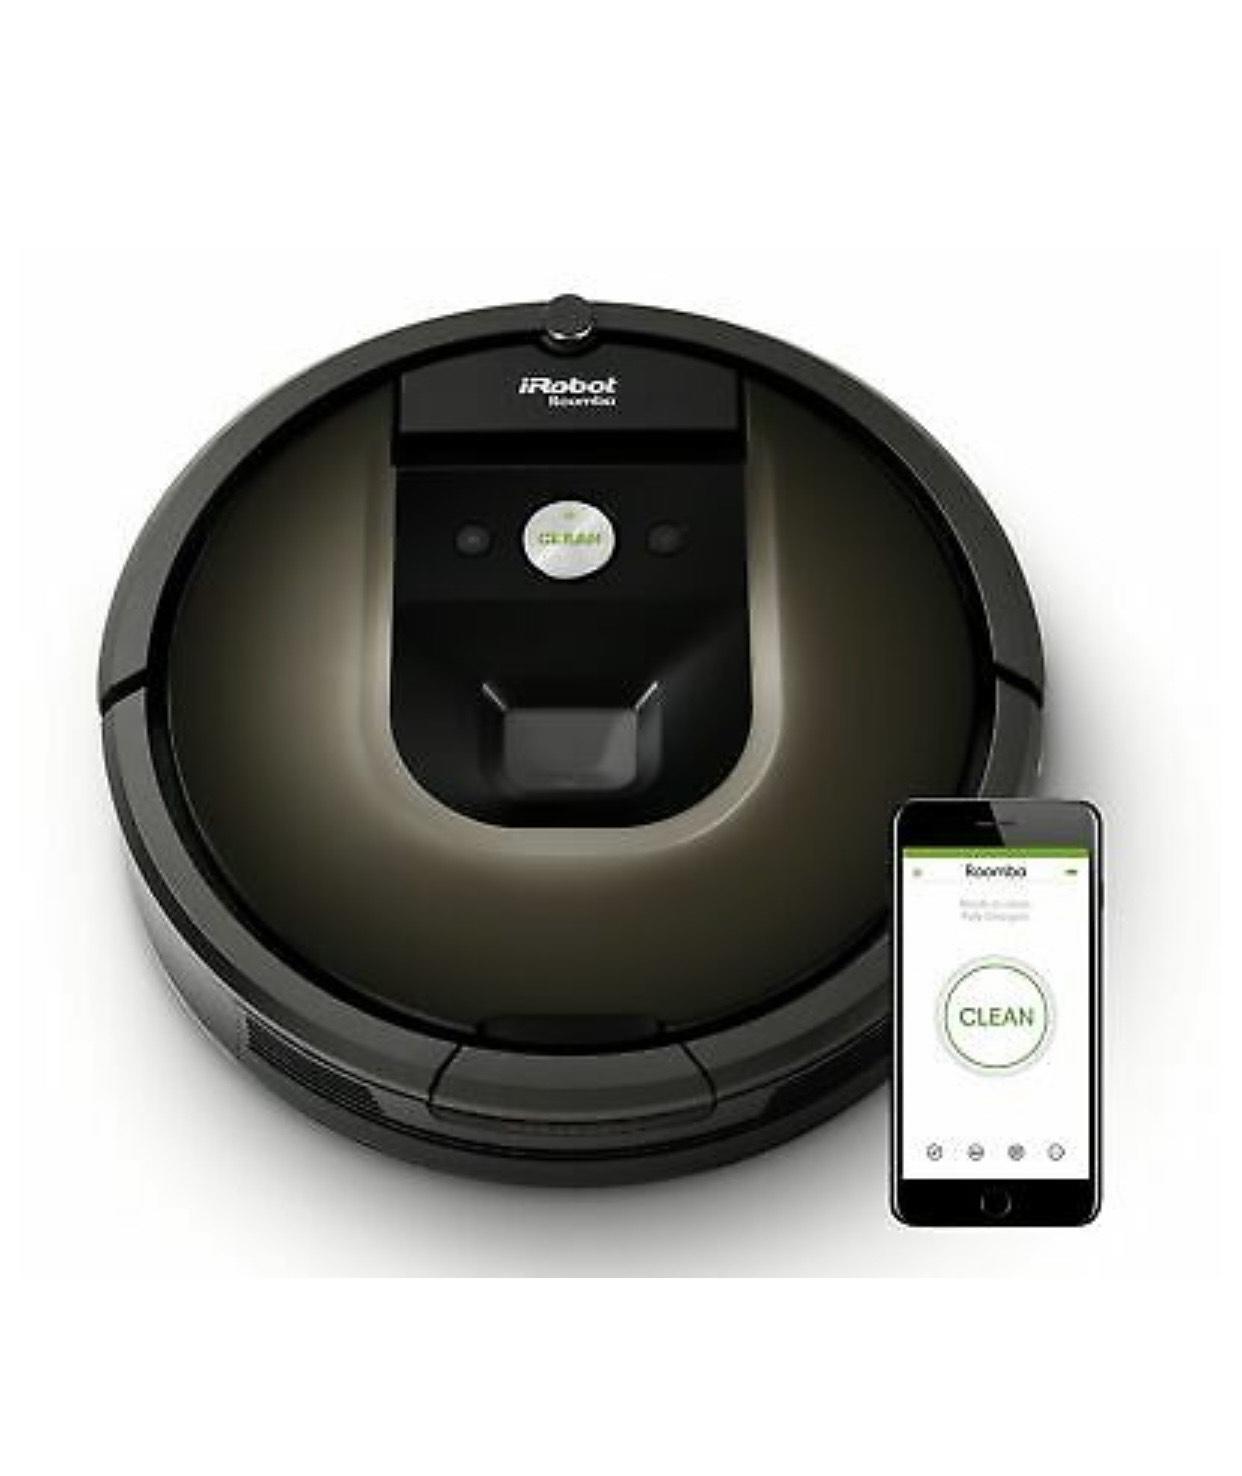 iRobot Roomba 980 Saugroboter generalüberholt Teppich-Turbomodus Roboter Wlan